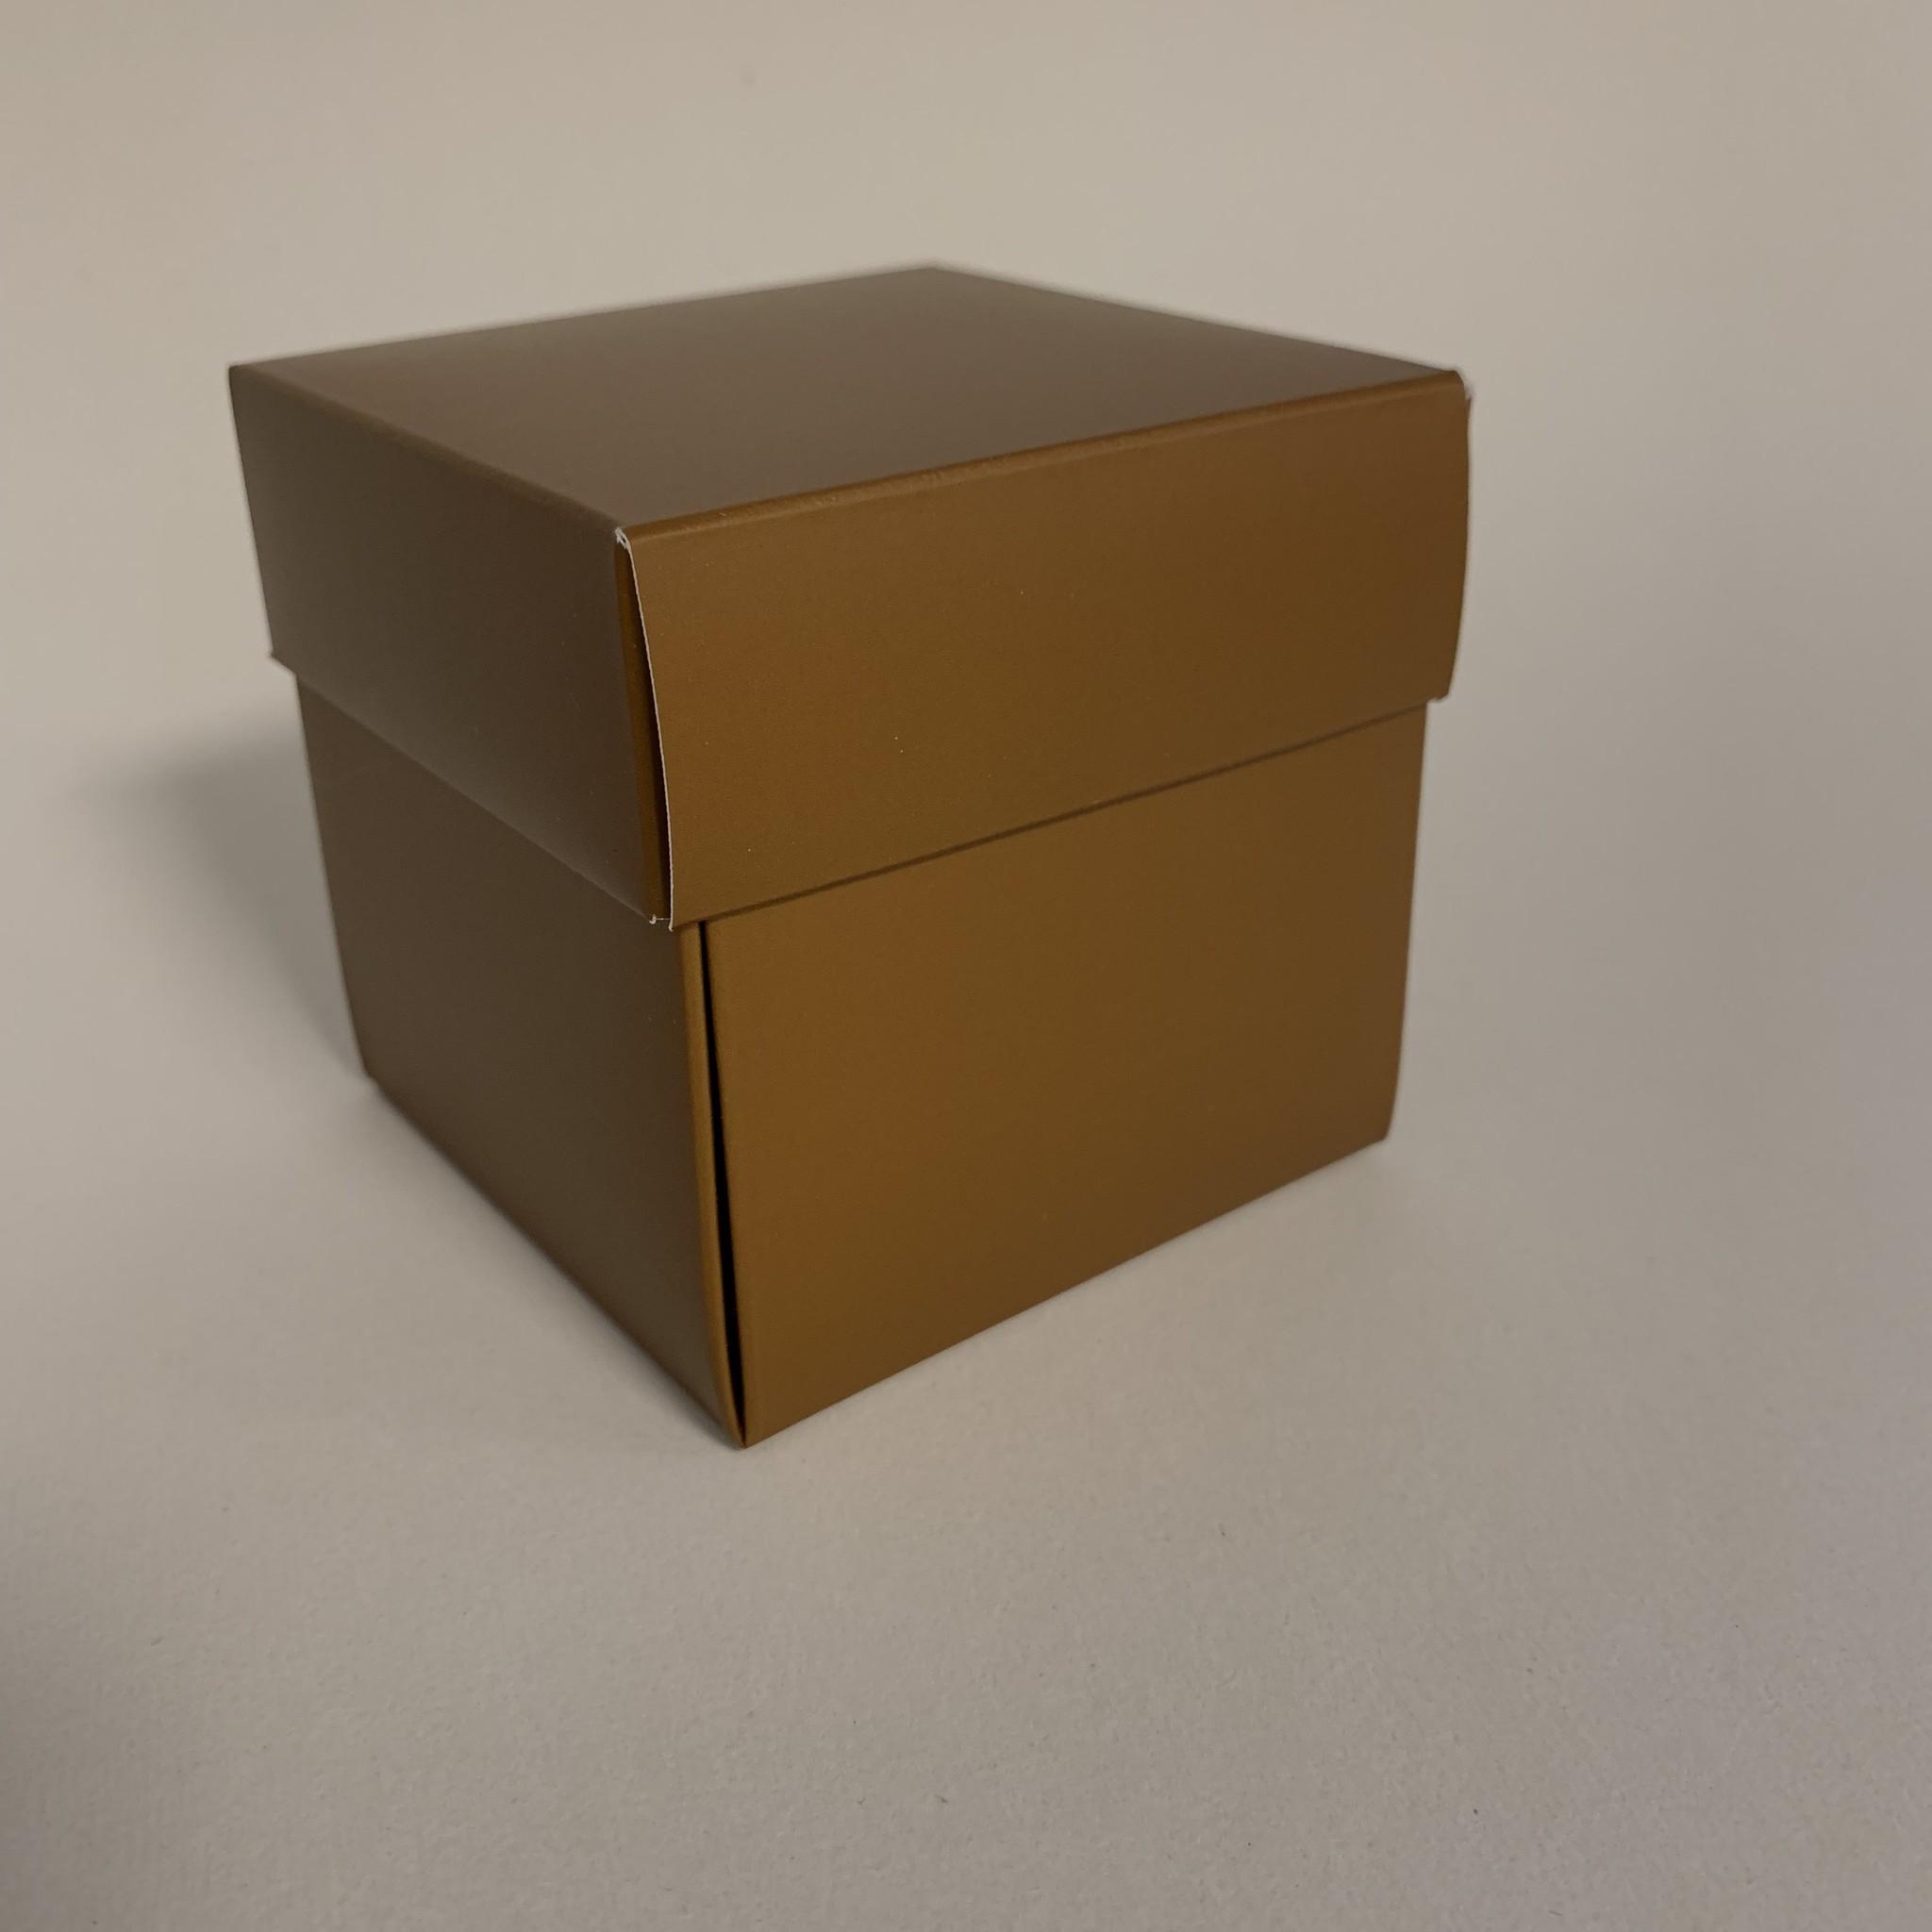 Kubus verpakking 60x60x60mm (25stuks)